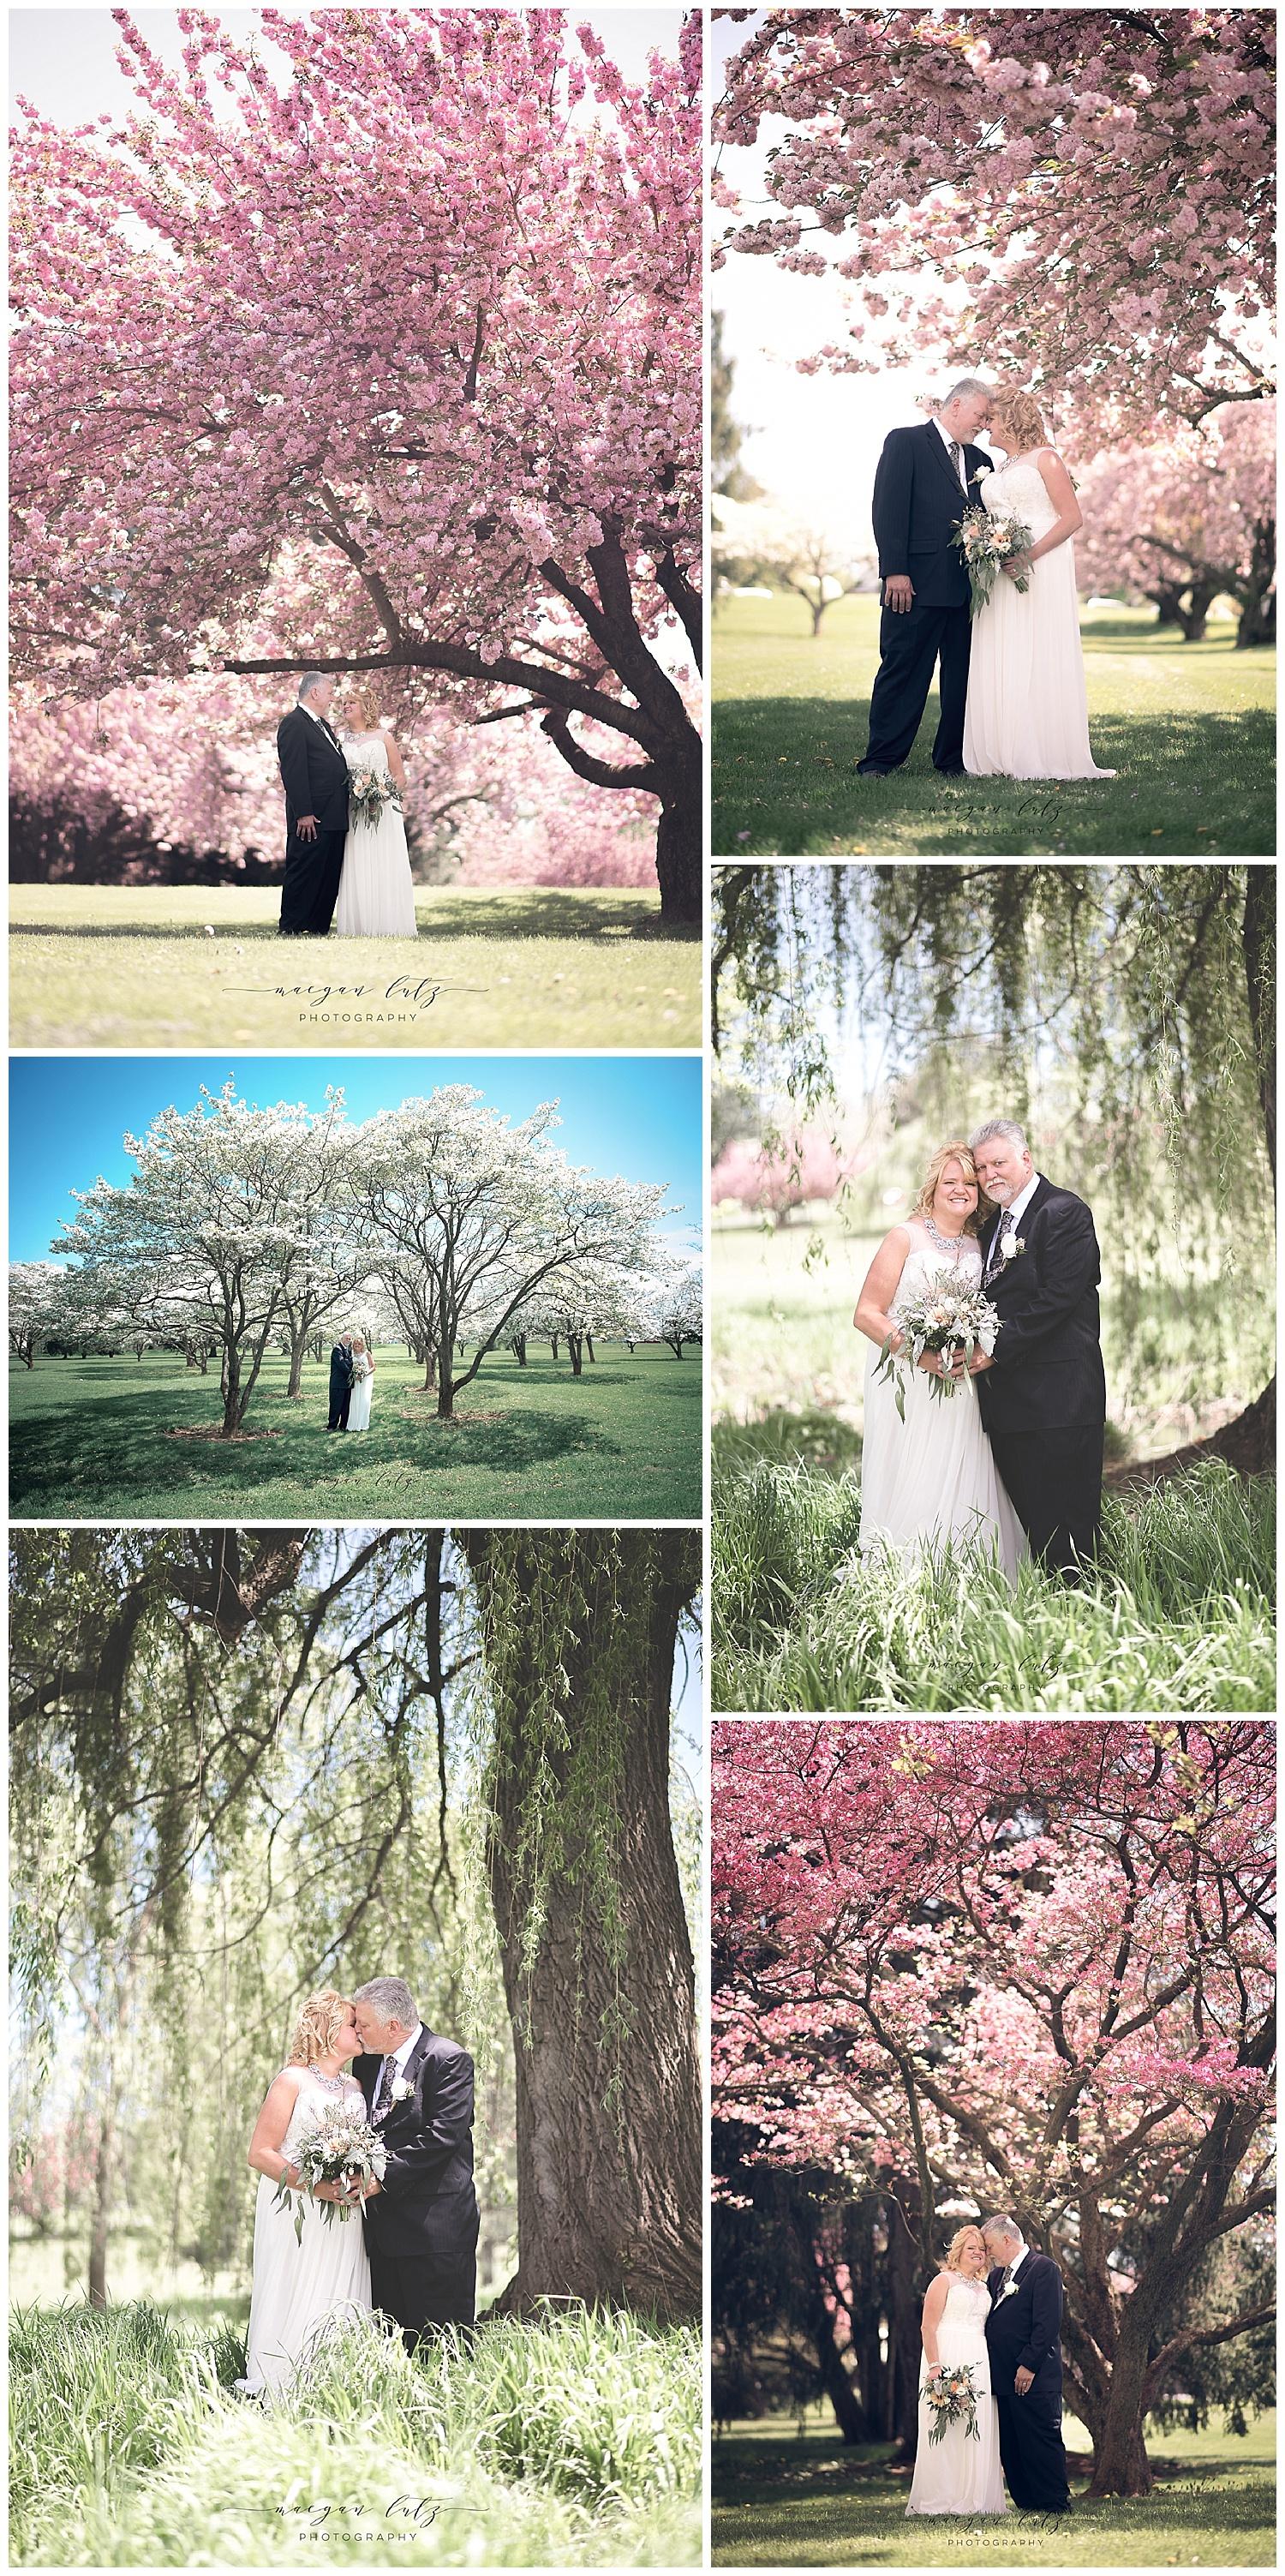 Destination Wedding Photographer in NEPA